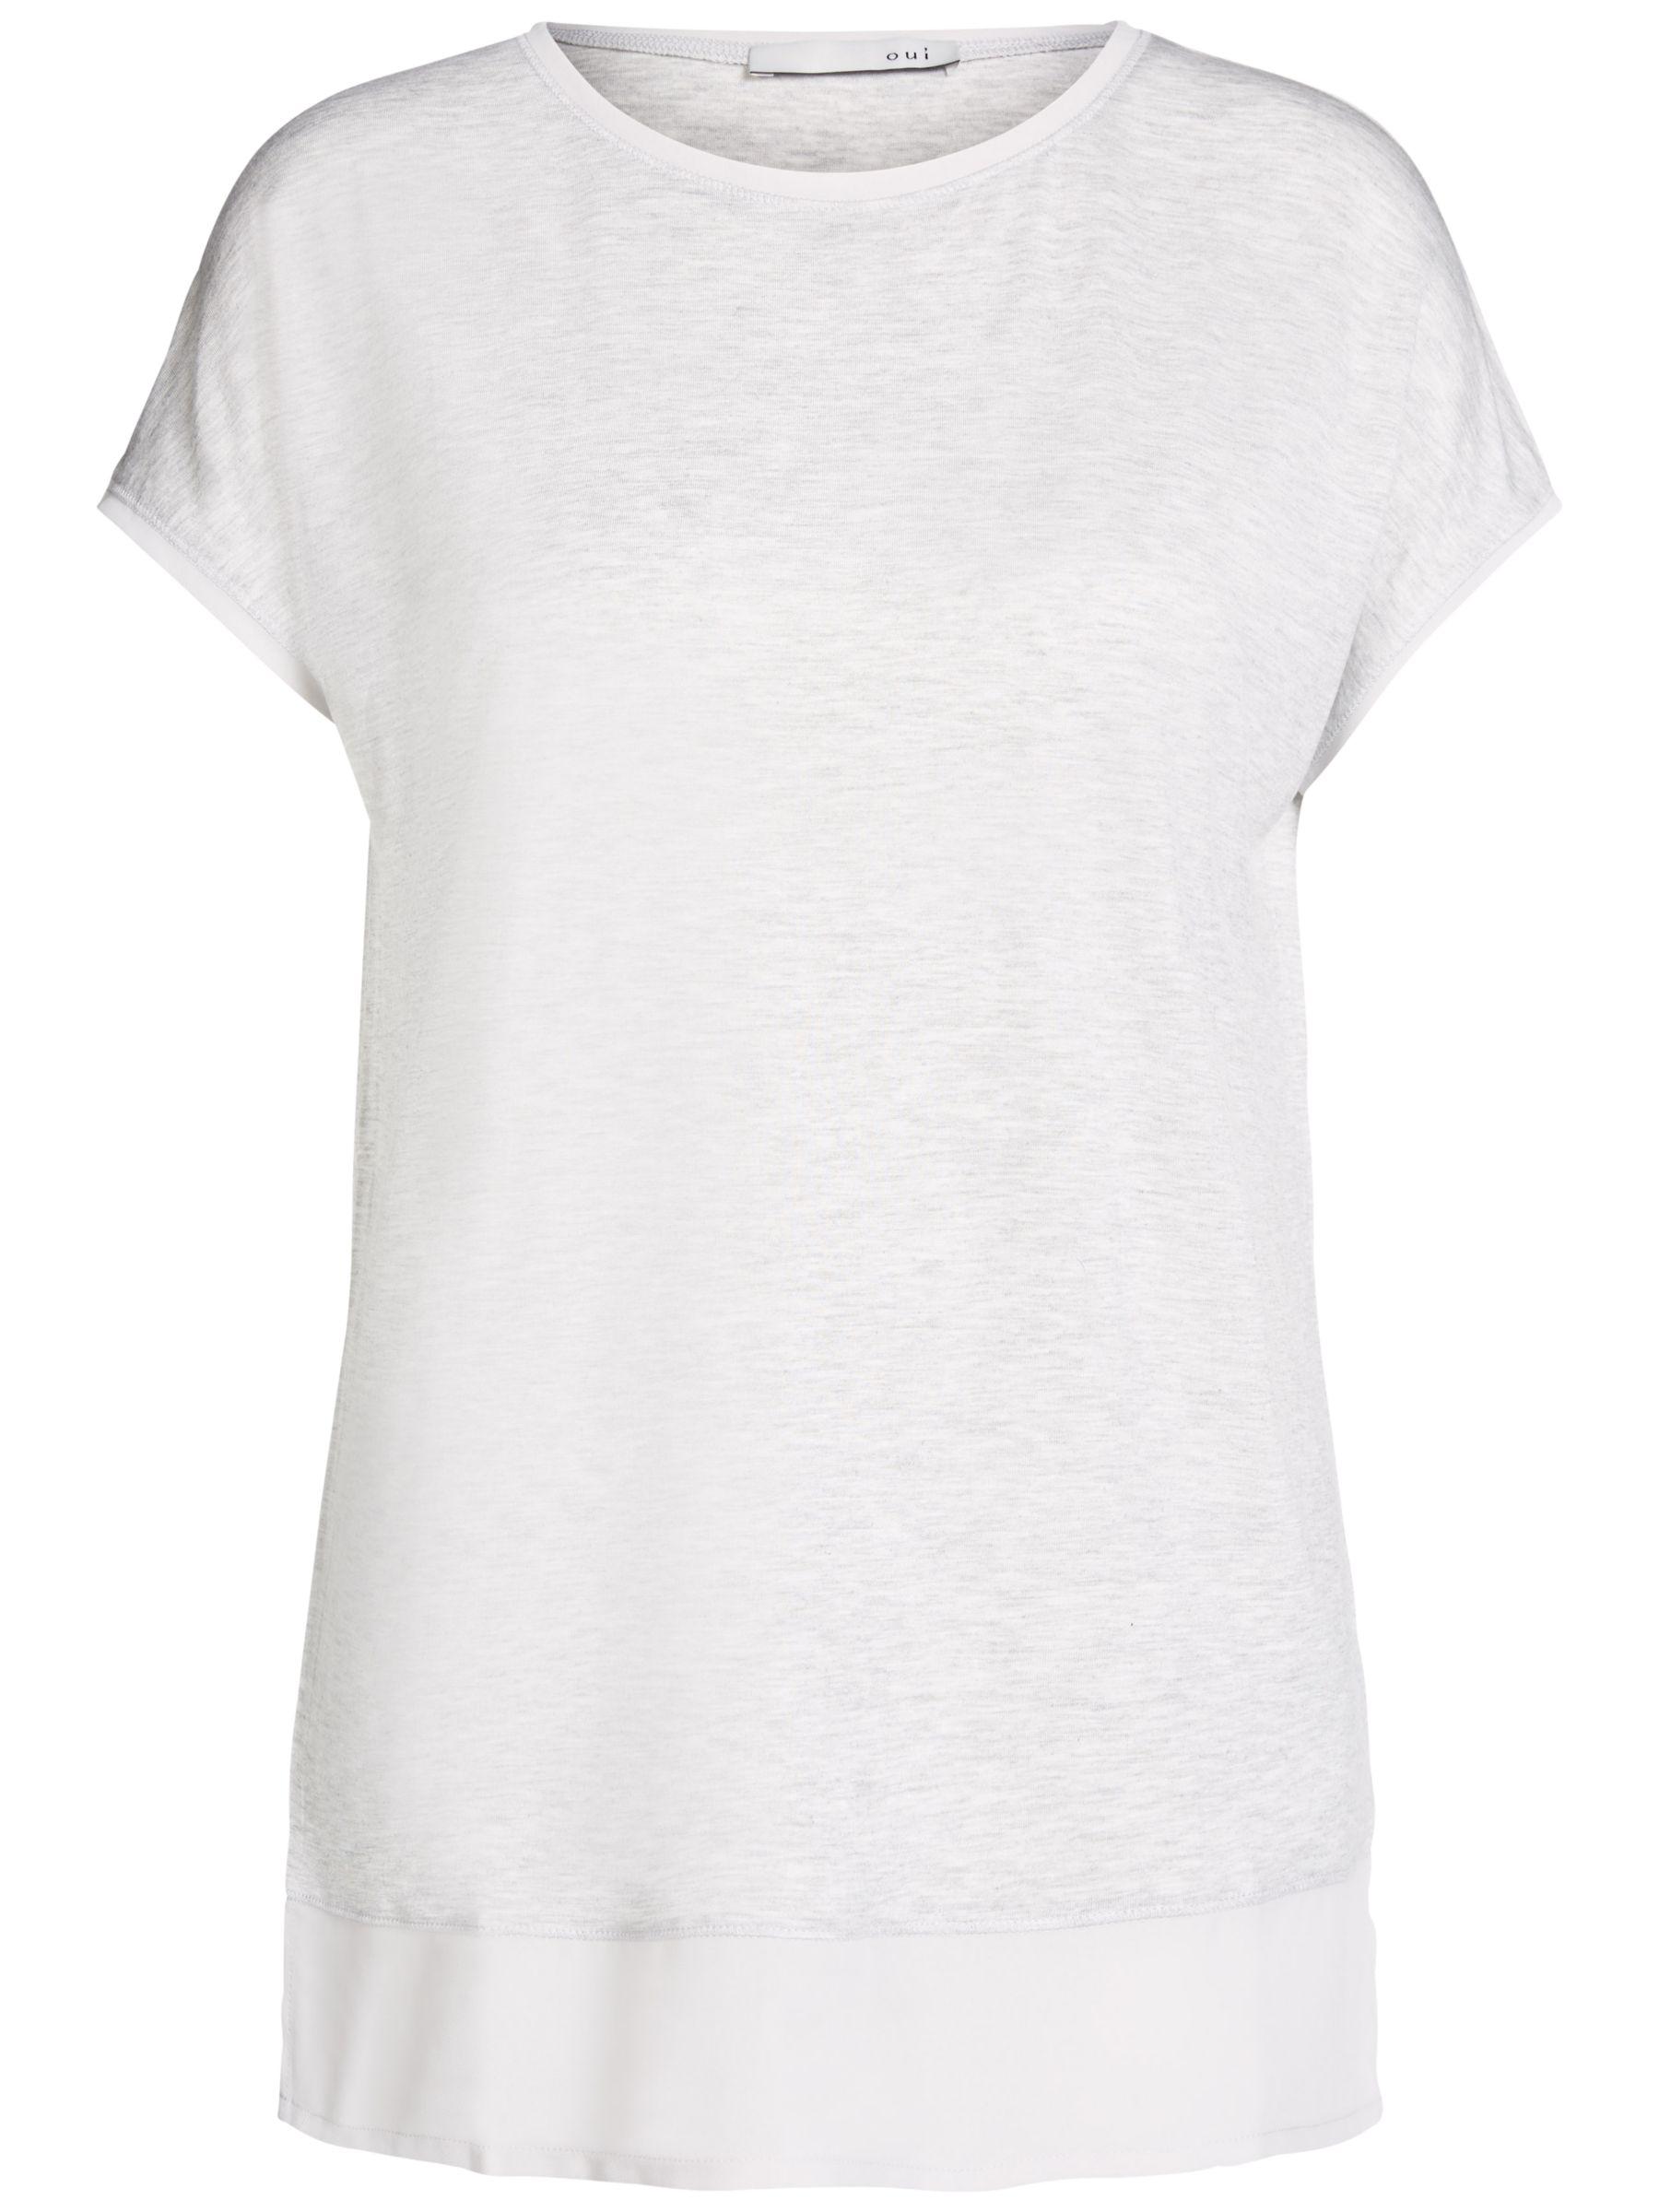 Oui Oui Contrast T-Shirt, Light Grey/White